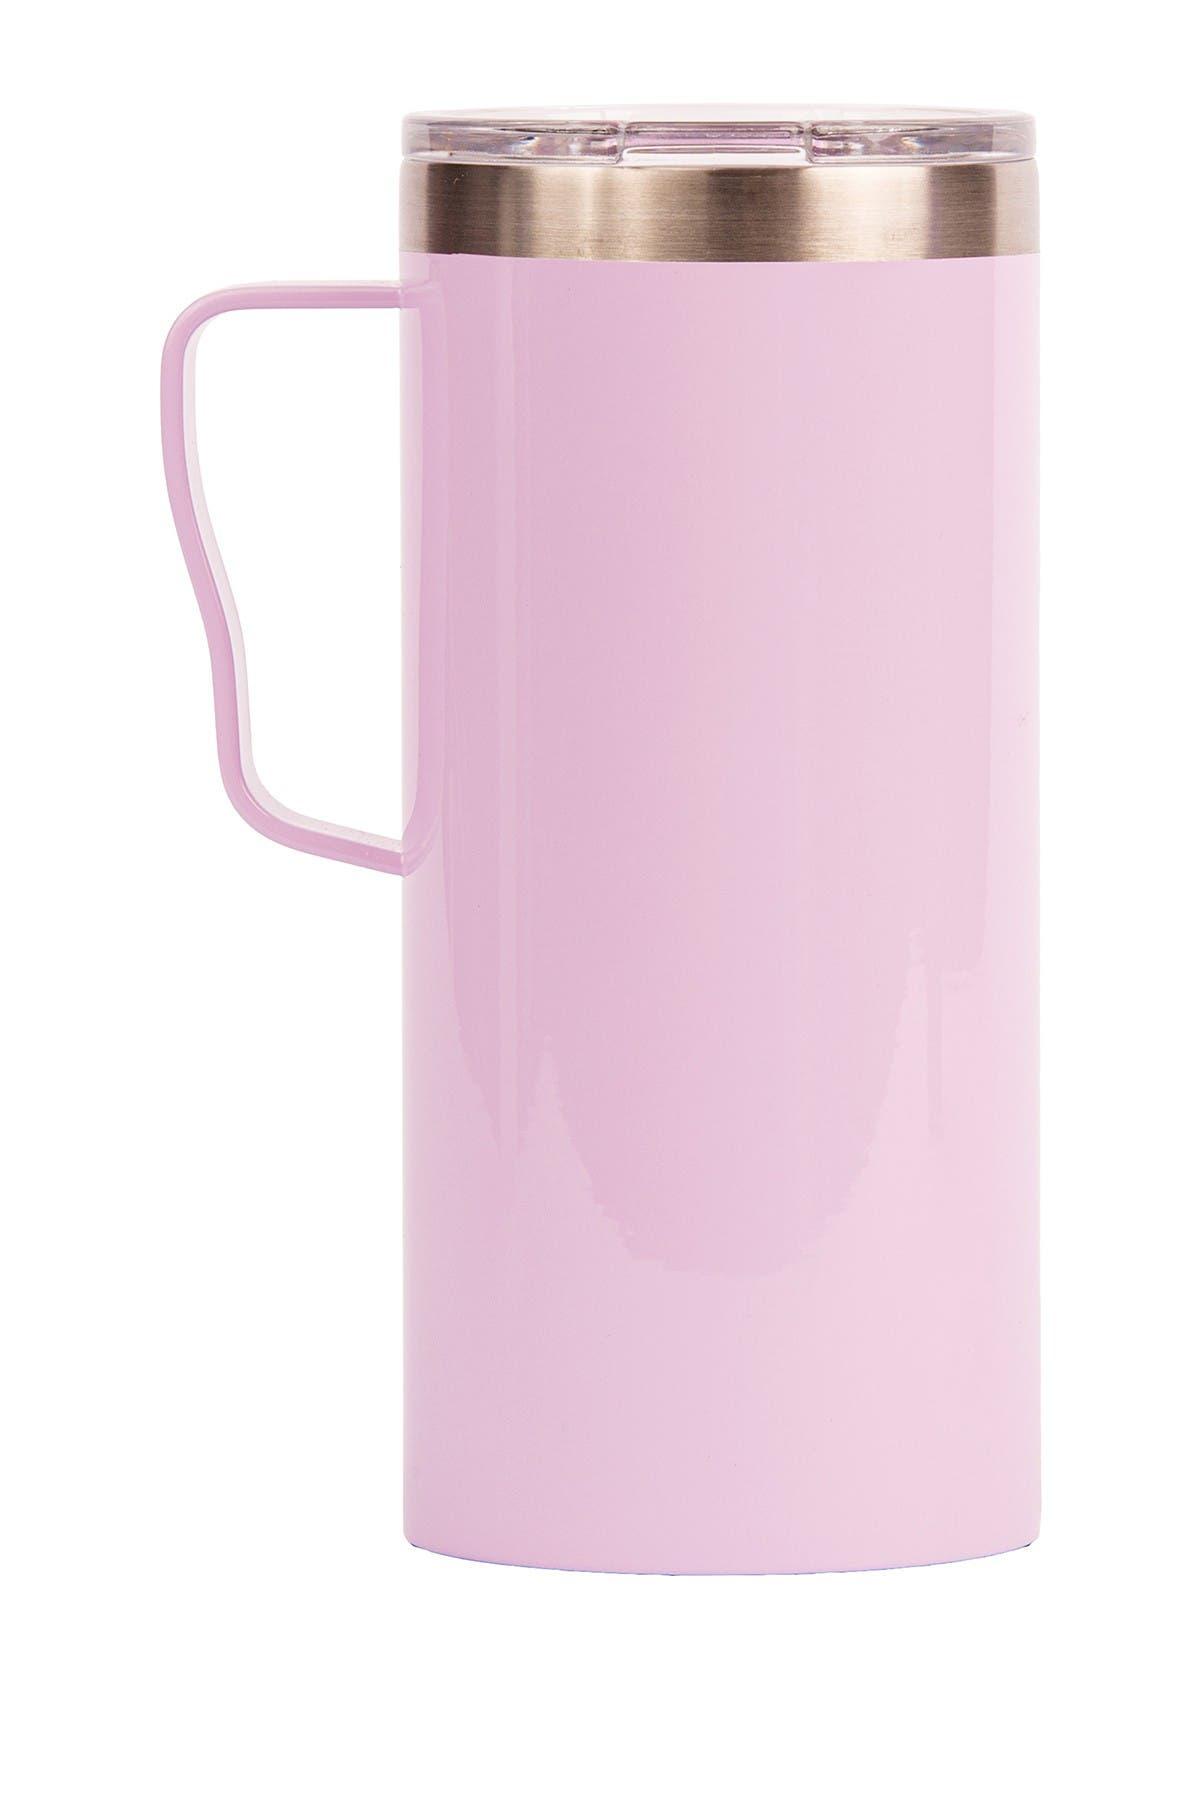 Image of PURE DRINKWARE Refresh by PURE 18oz. Coffee Mug - Lilac